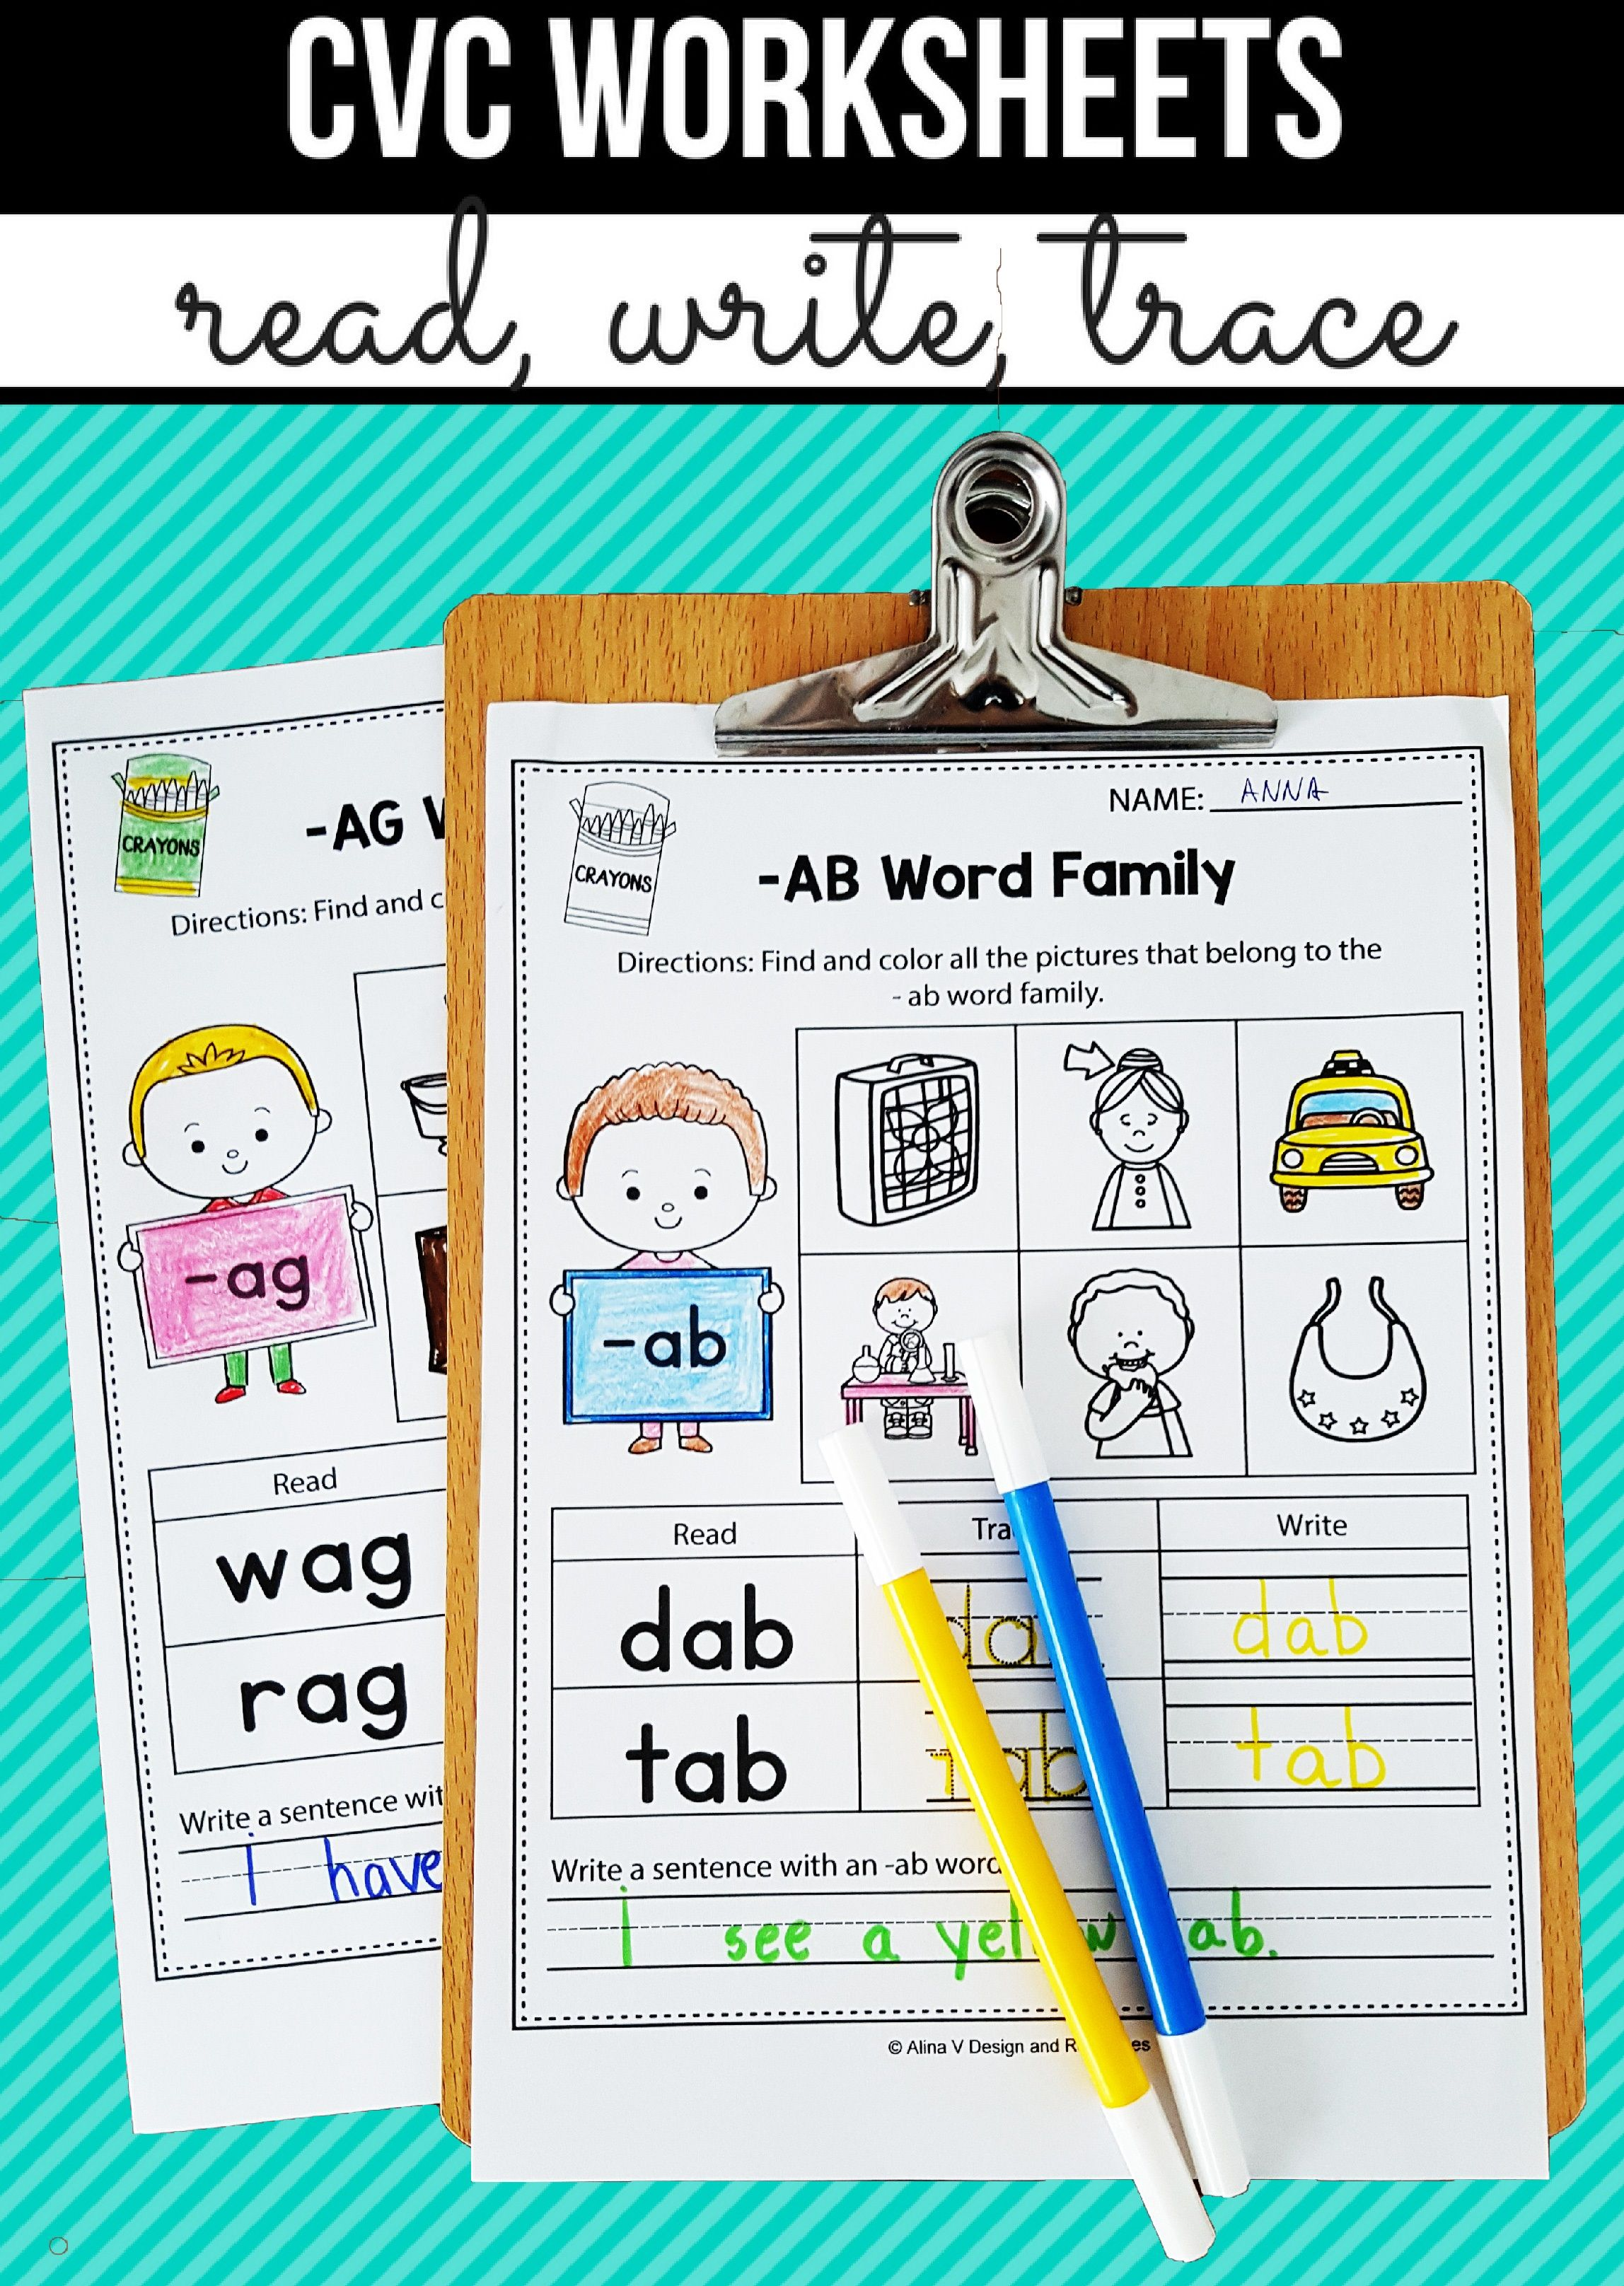 CVC Words Worksheets All Vowels CVC Word Families Worksheets Kindergarten    Cvc words [ 3232 x 2296 Pixel ]